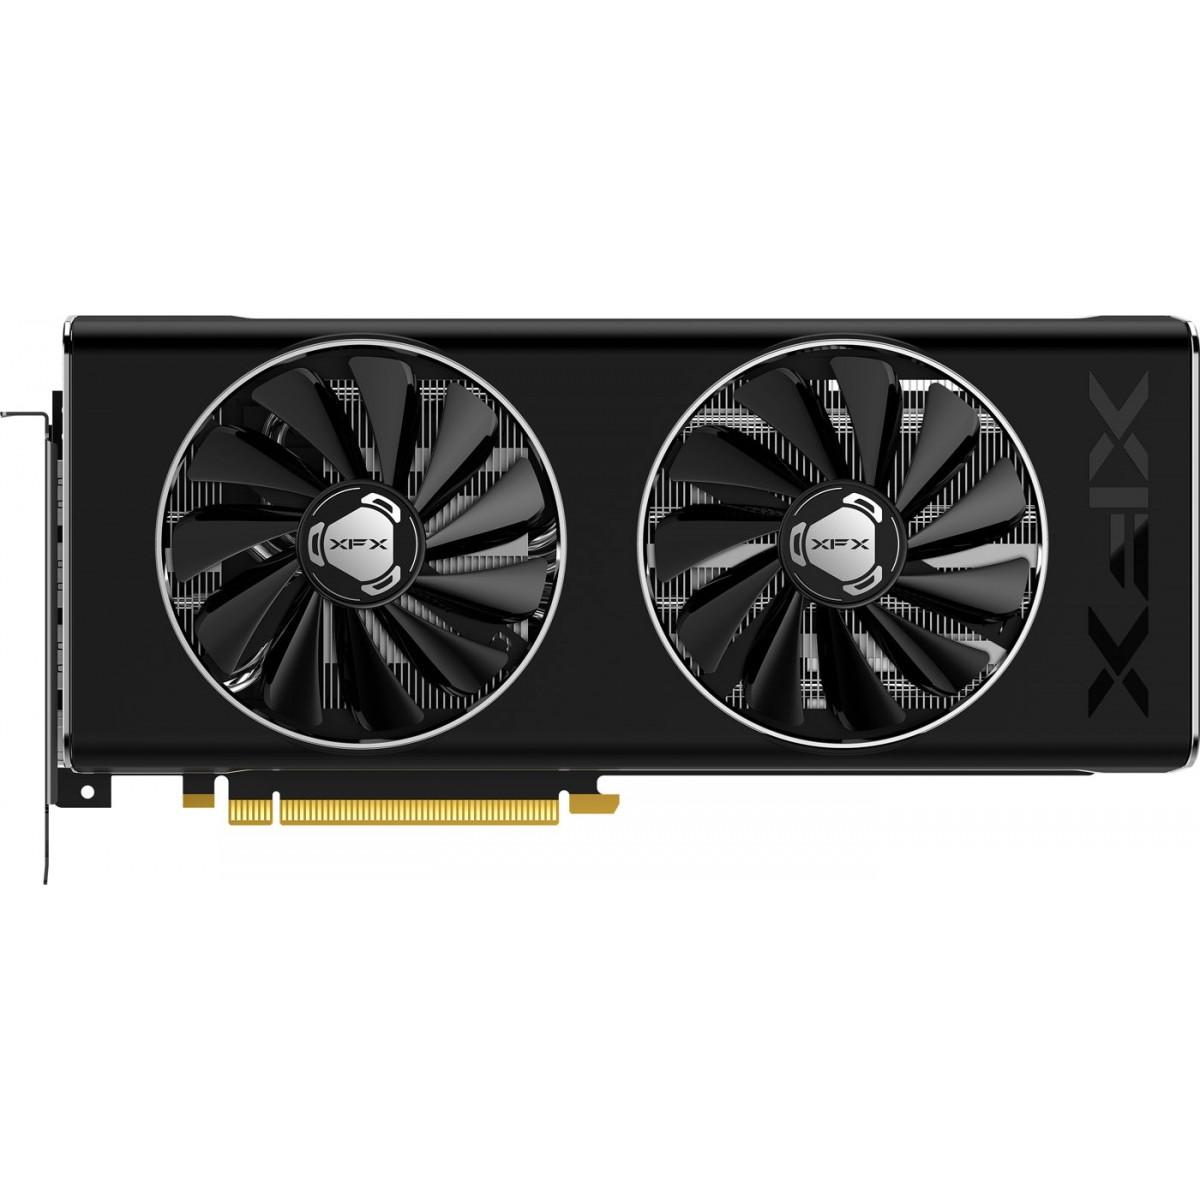 Placa de Vídeo XFX Radeon Navi RX 5700 XT, THICC II, 8GB GDDR6, 256Bit